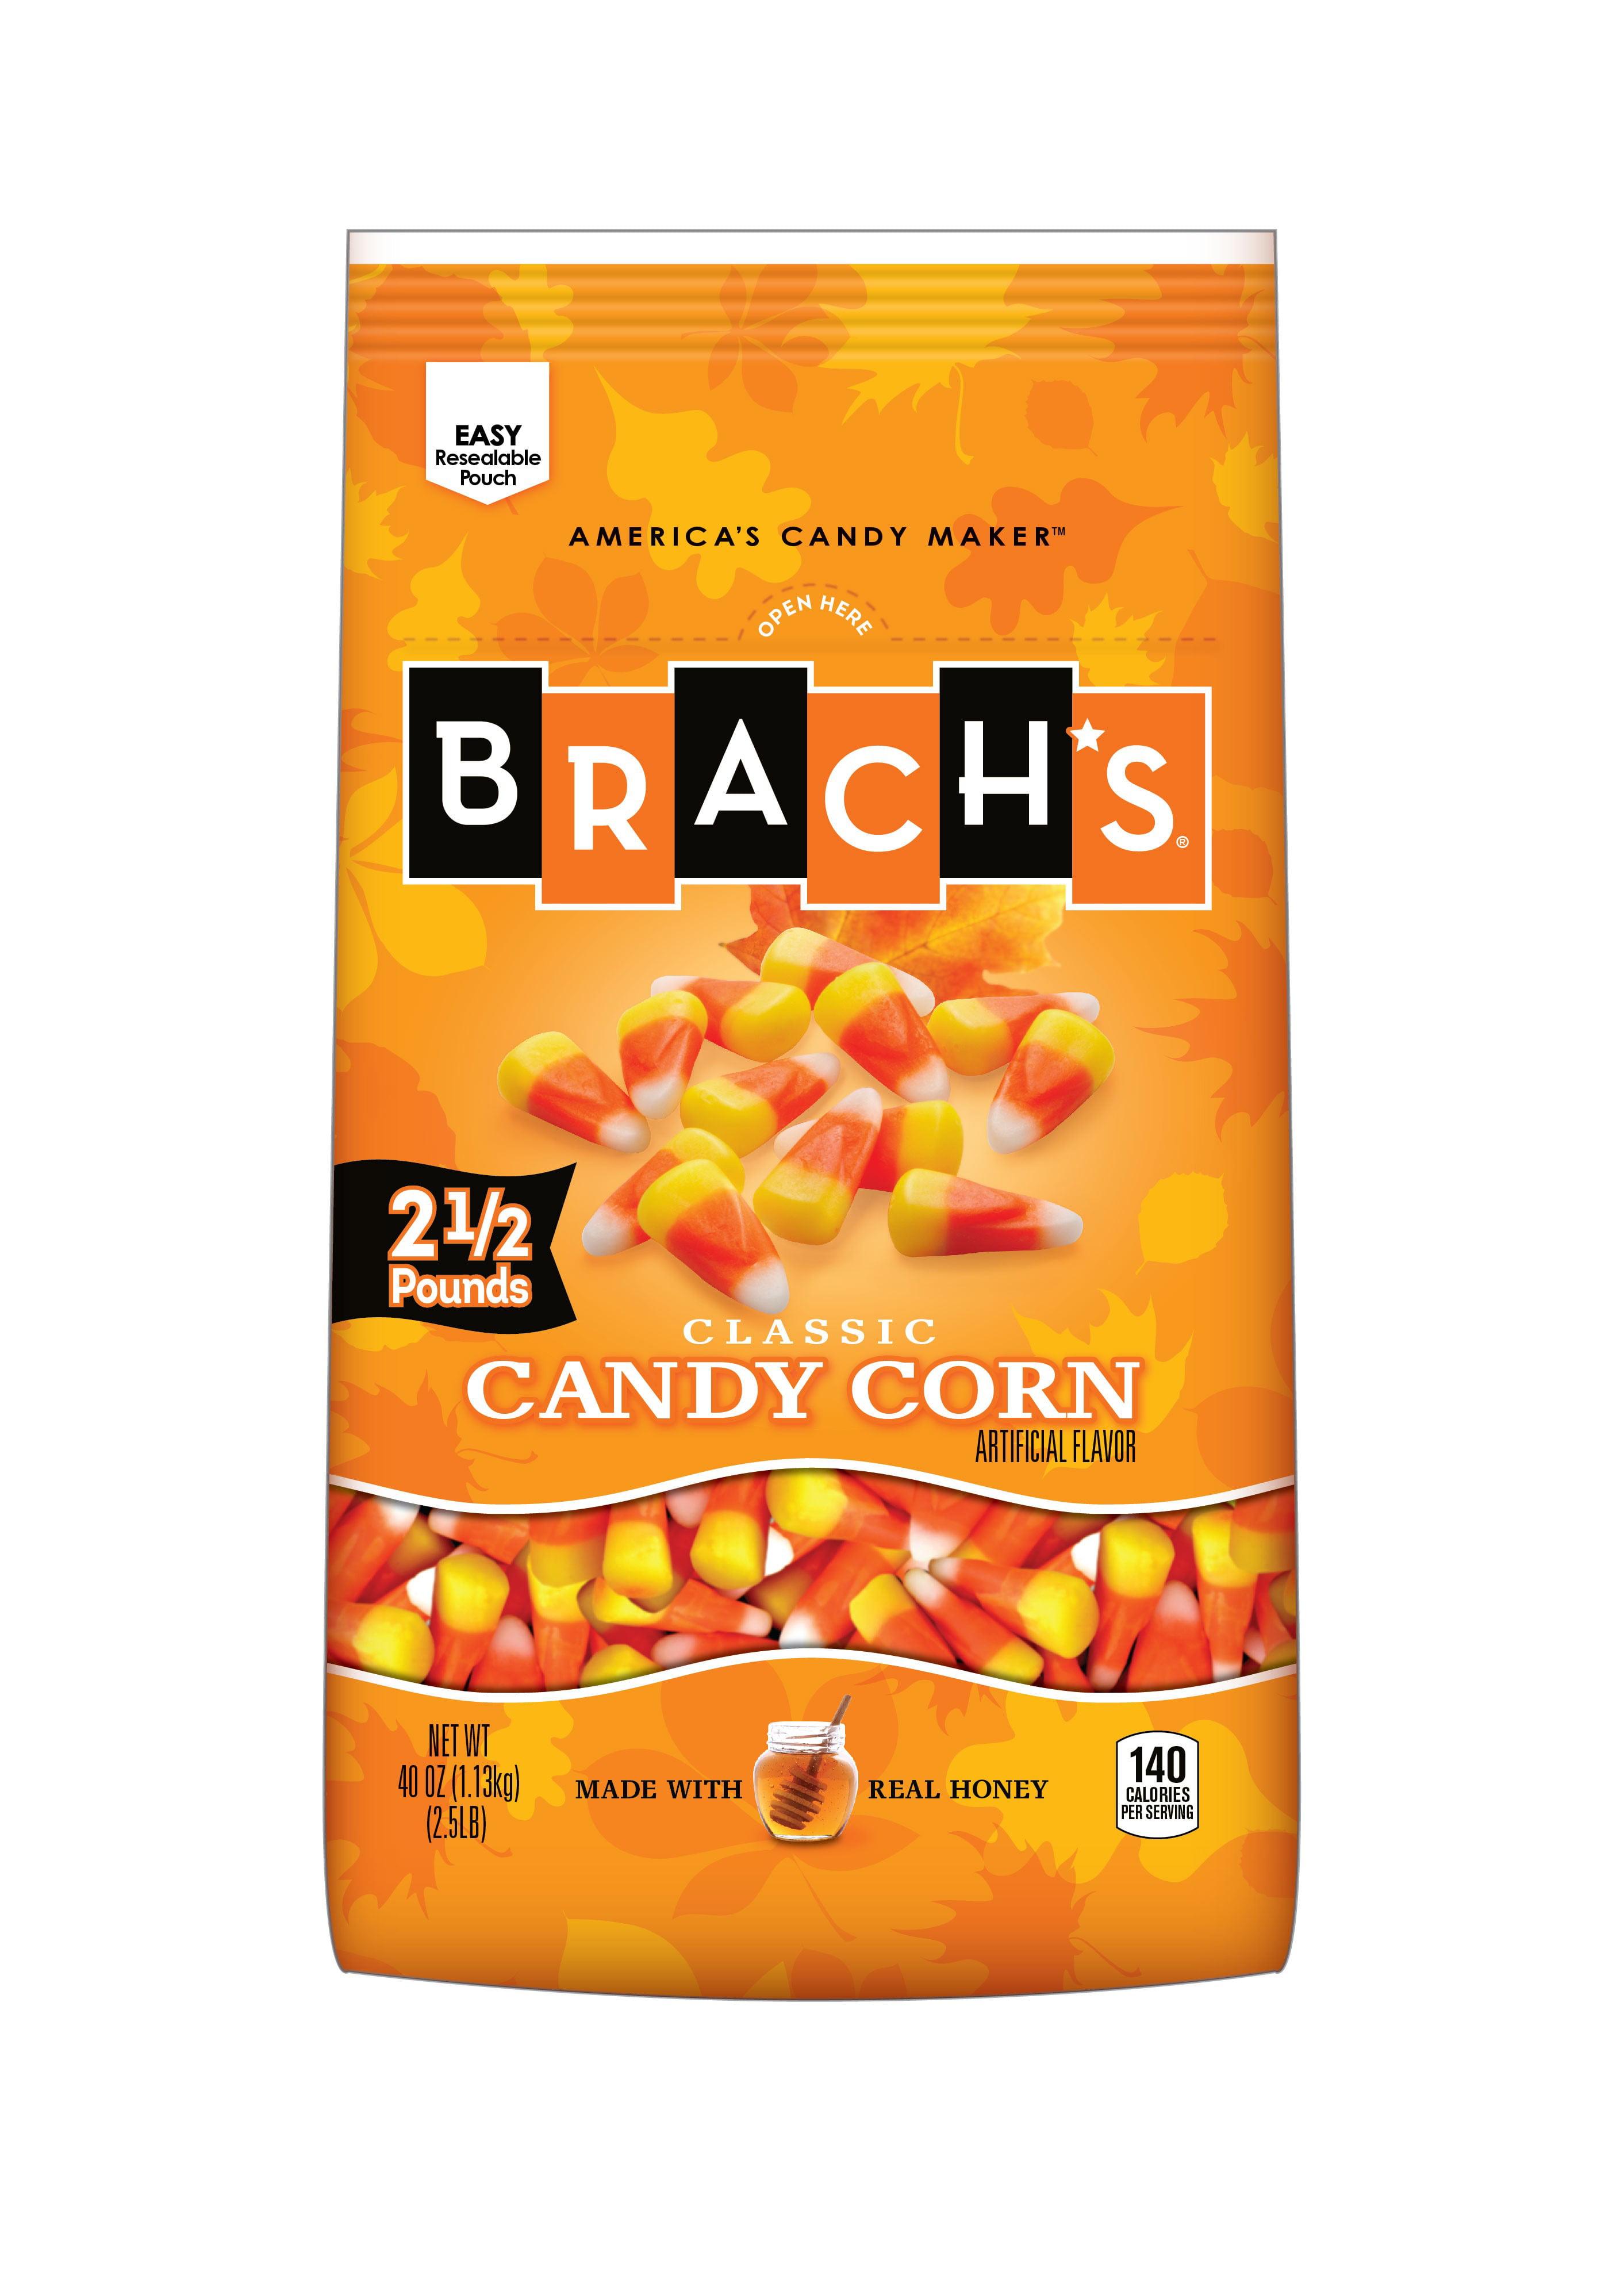 Brach's Original Flavor Candy Corn, 40 Oz